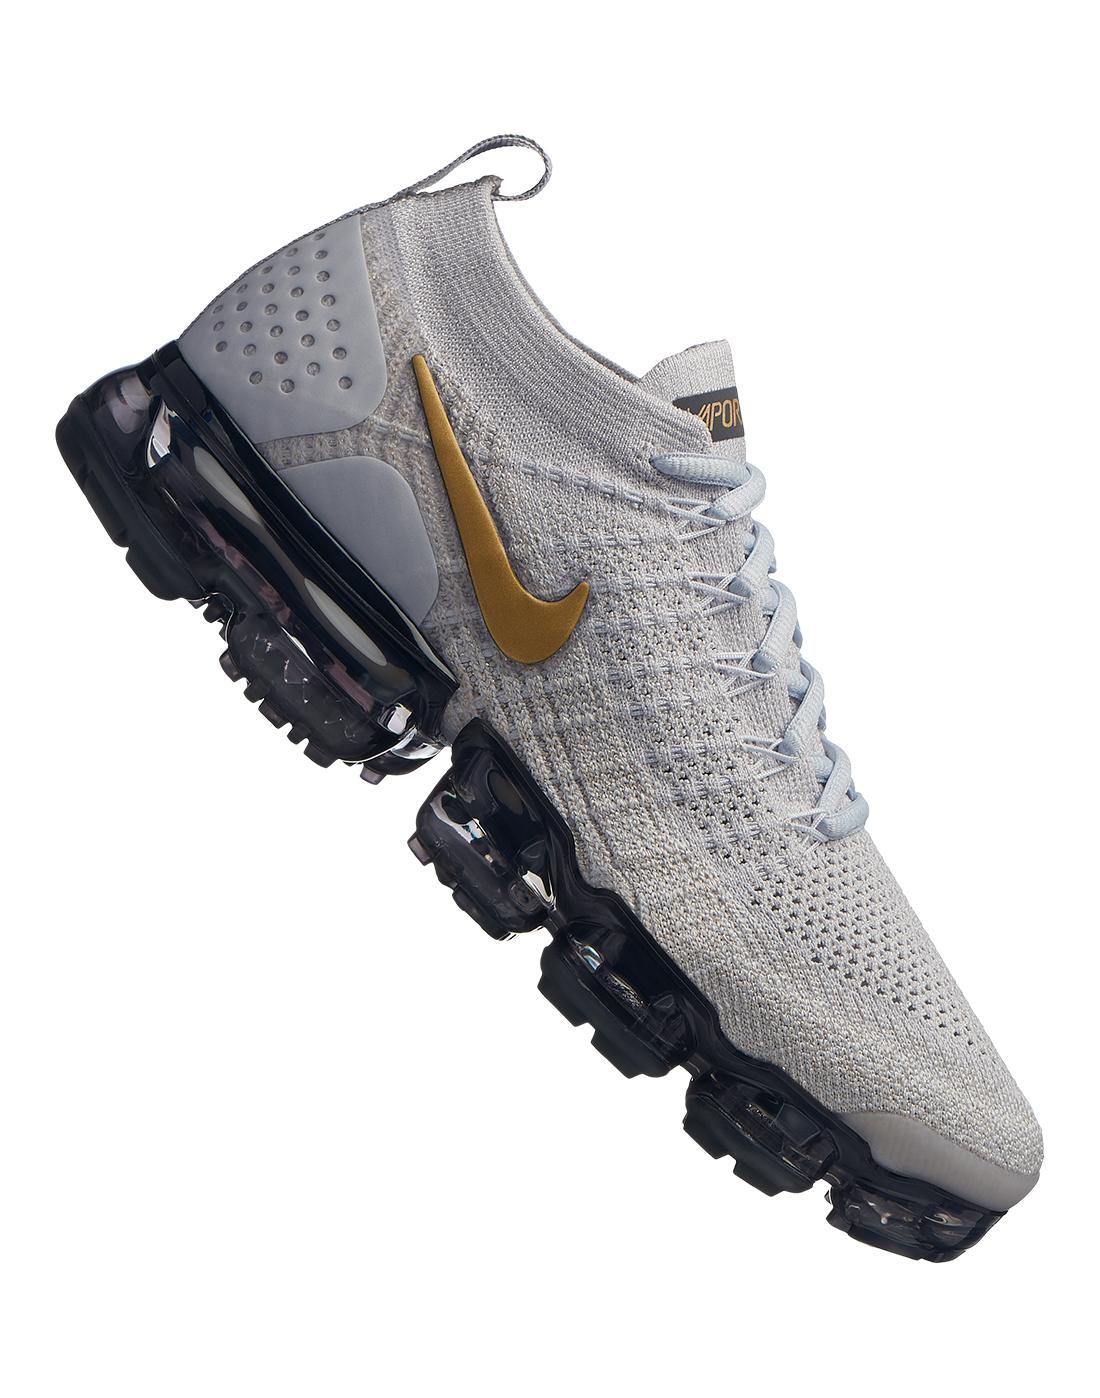 860daf9aa68 Women s Grey Nike VaporMax Flyknit